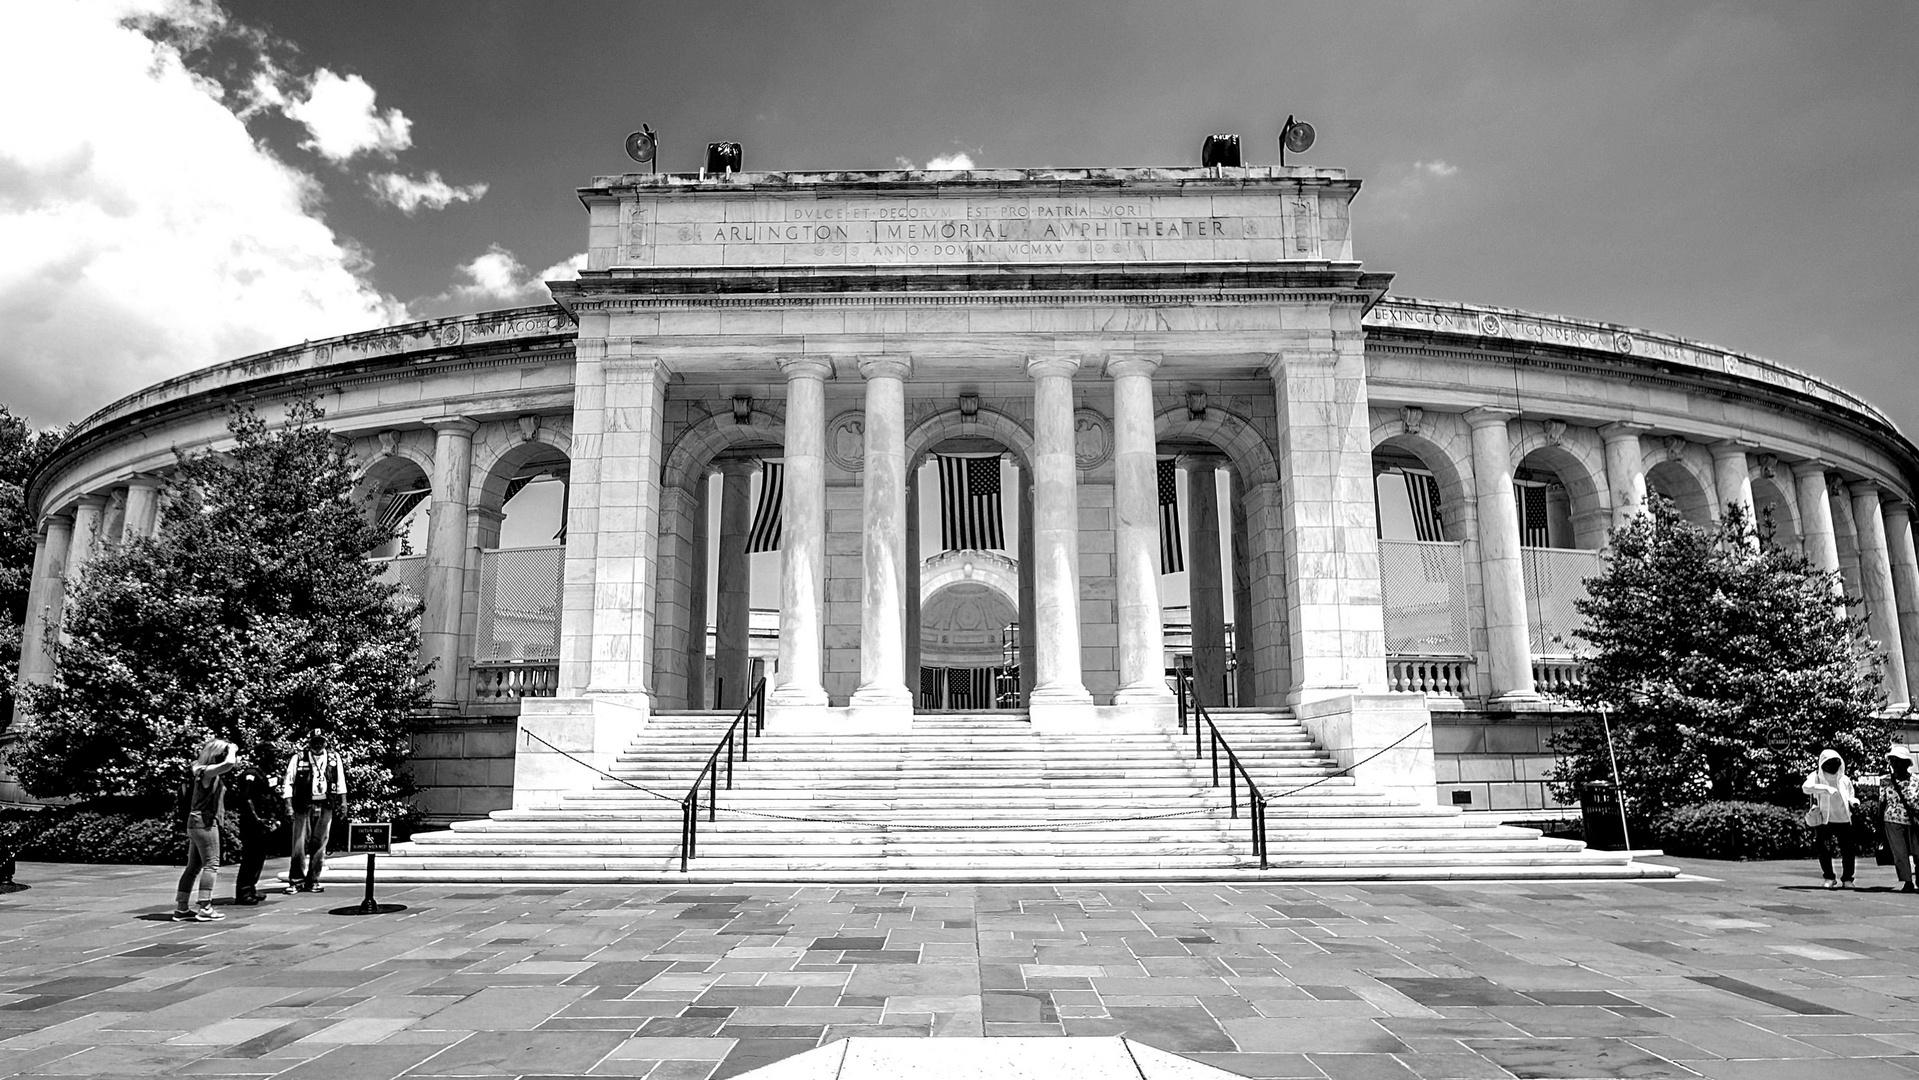 Arlington Memorial in Washington